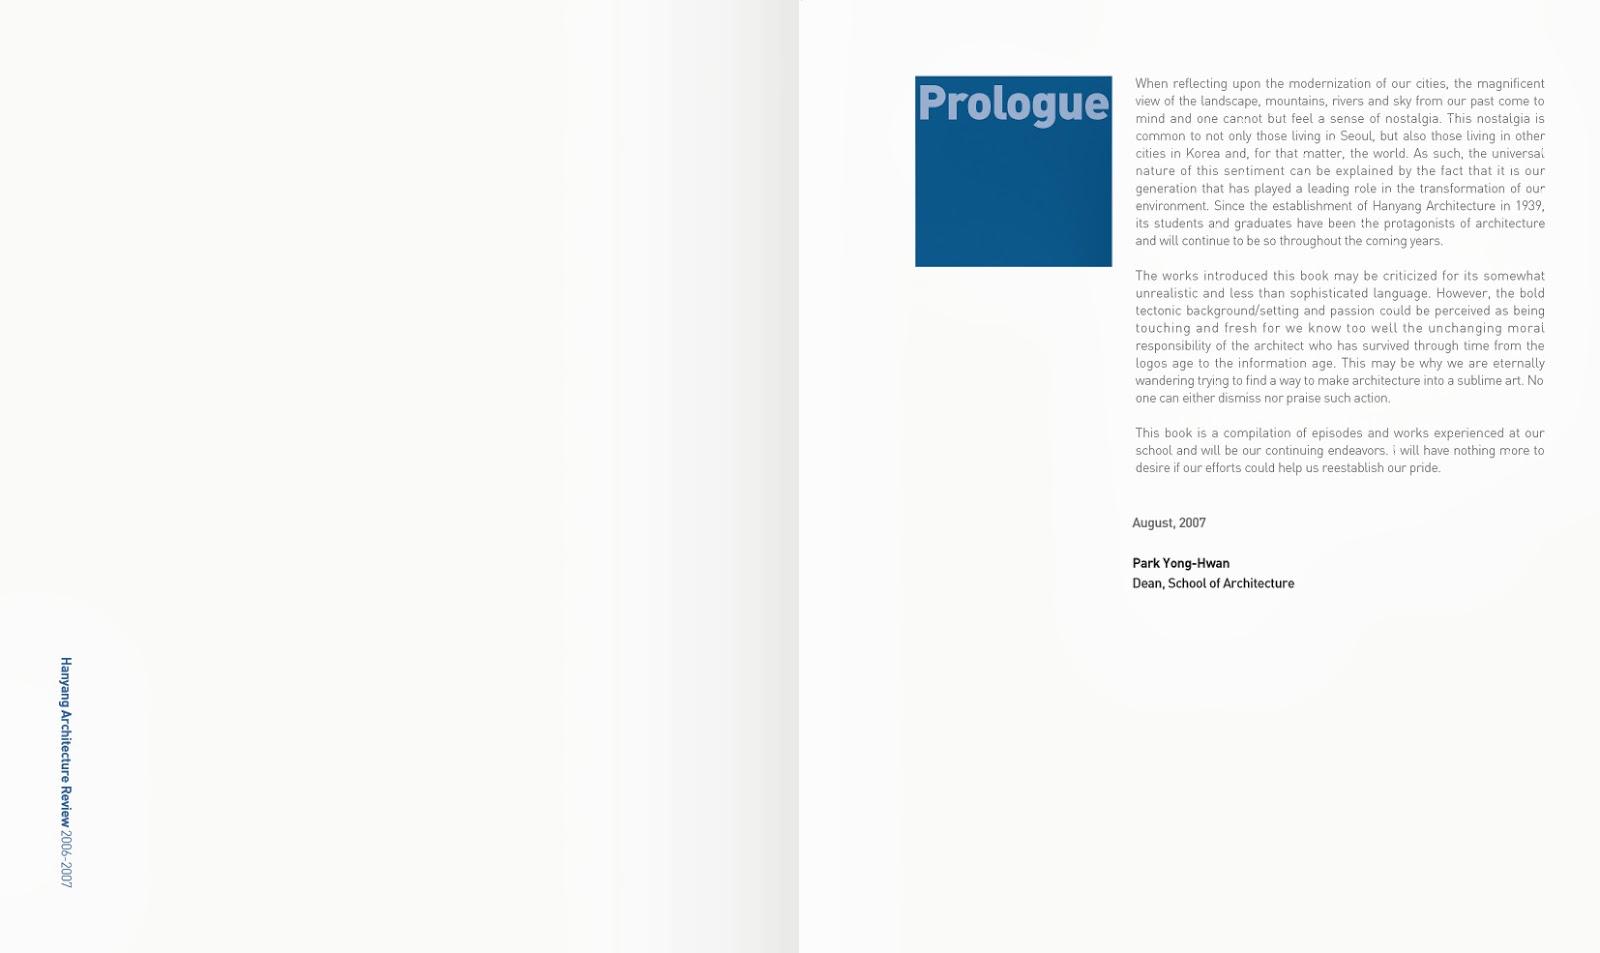 design SJ: 한양건축대학원 학술논문집 디자인